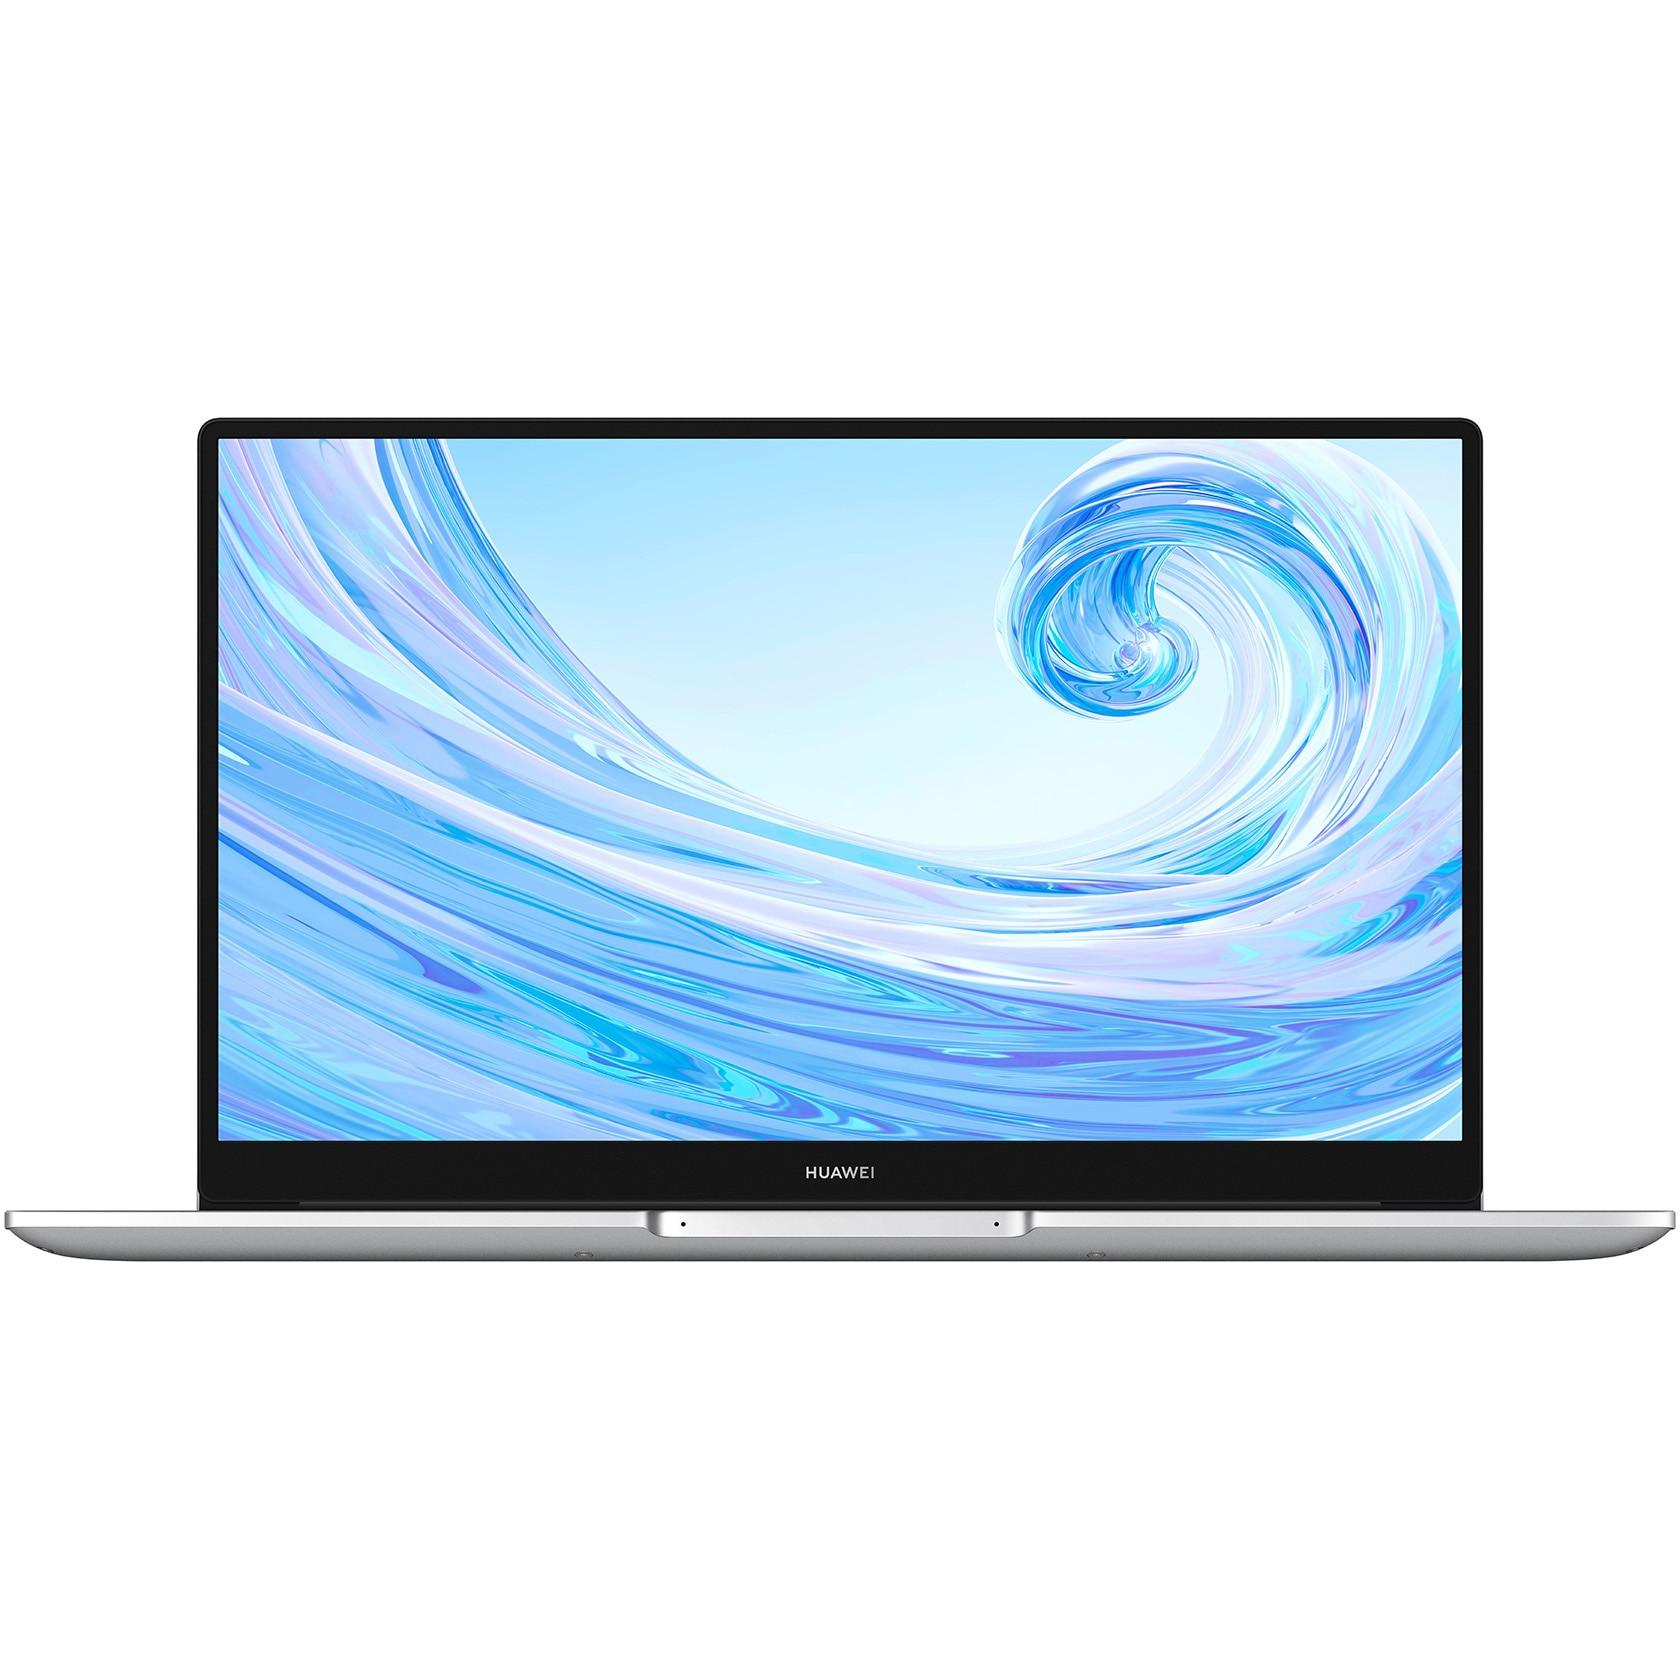 "Fotografie Laptop ultraportabil Huawei MateBook D15 2020 cu procesor AMD Ryzen™ 7 3700U pana la 4.00 GHz, 15.6"", Full HD, 8GB, 512GB SSD, AMD Radeon Graphics, Windows 10 Home, Silver"